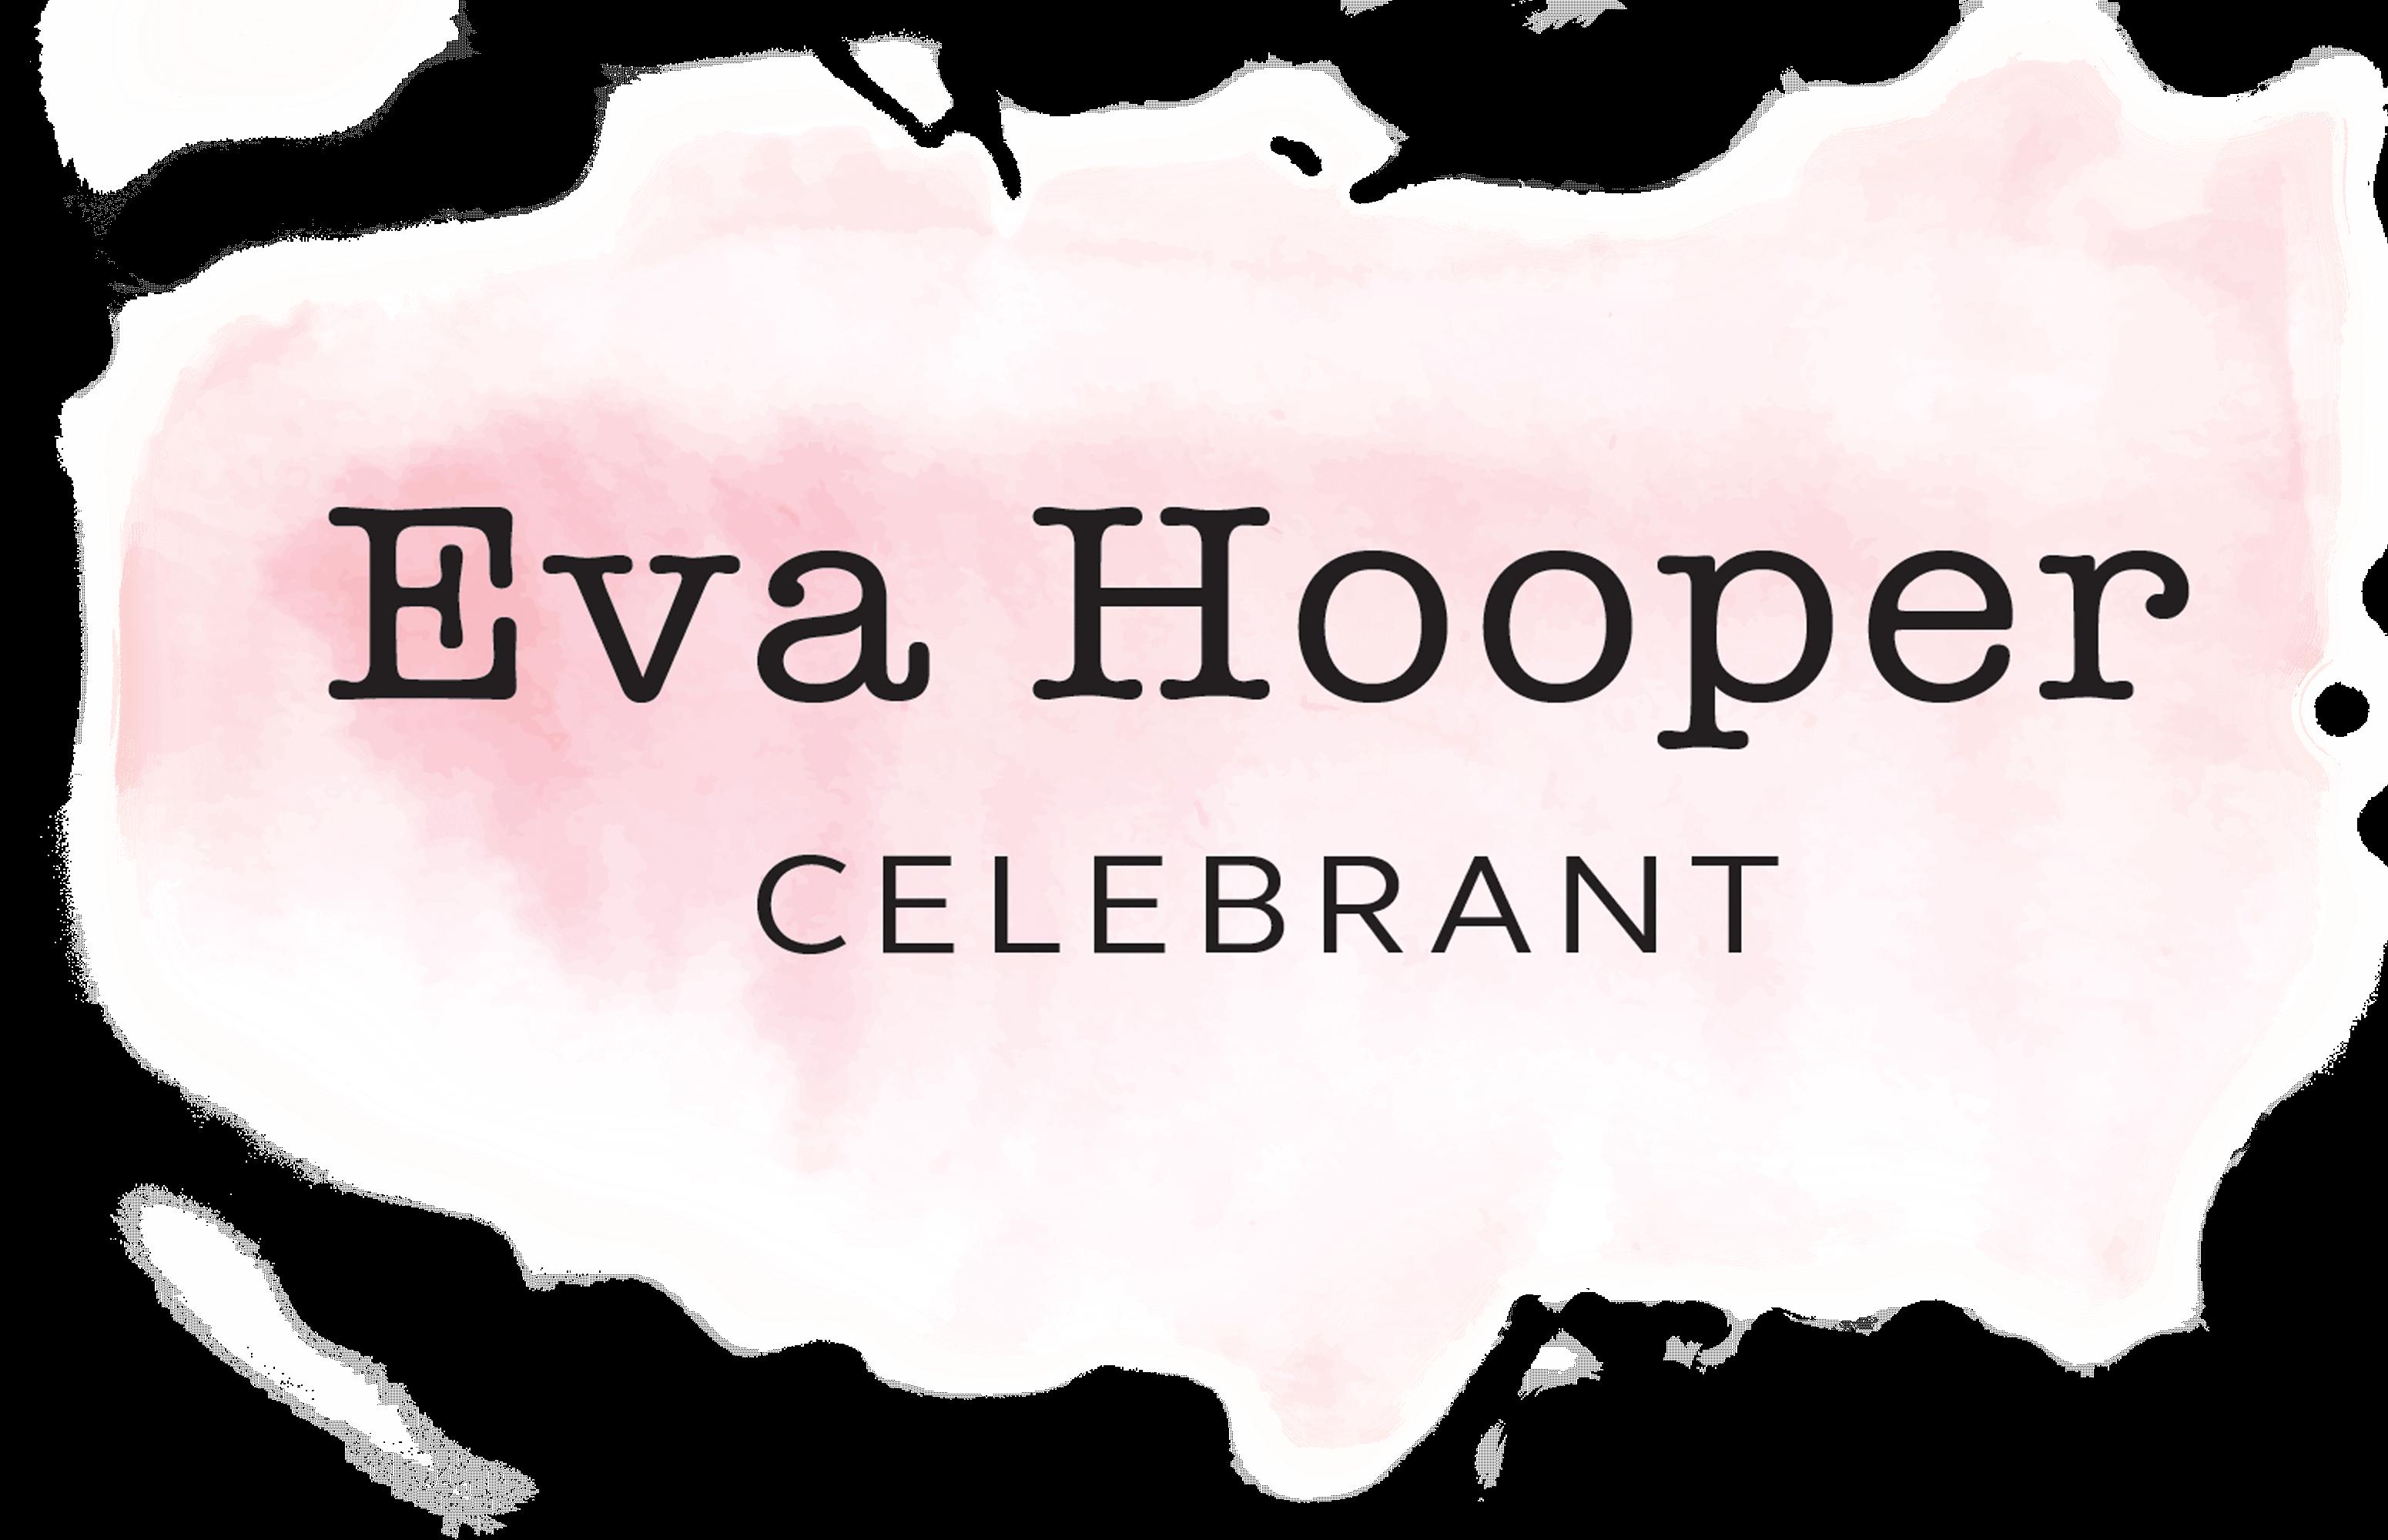 Eva Hooper Celebrant